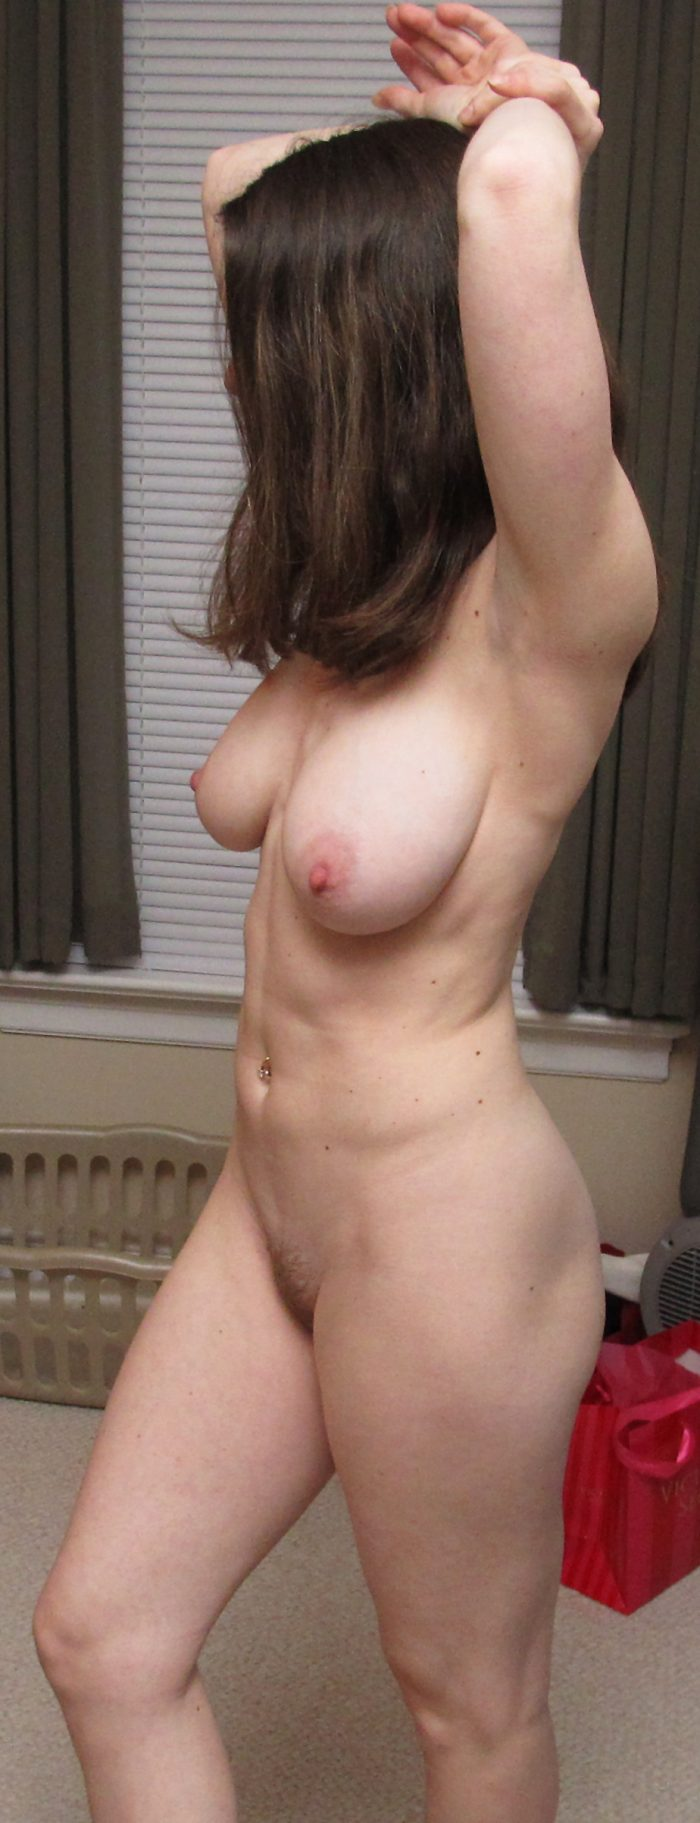 Hot amateur brunette with big breasts